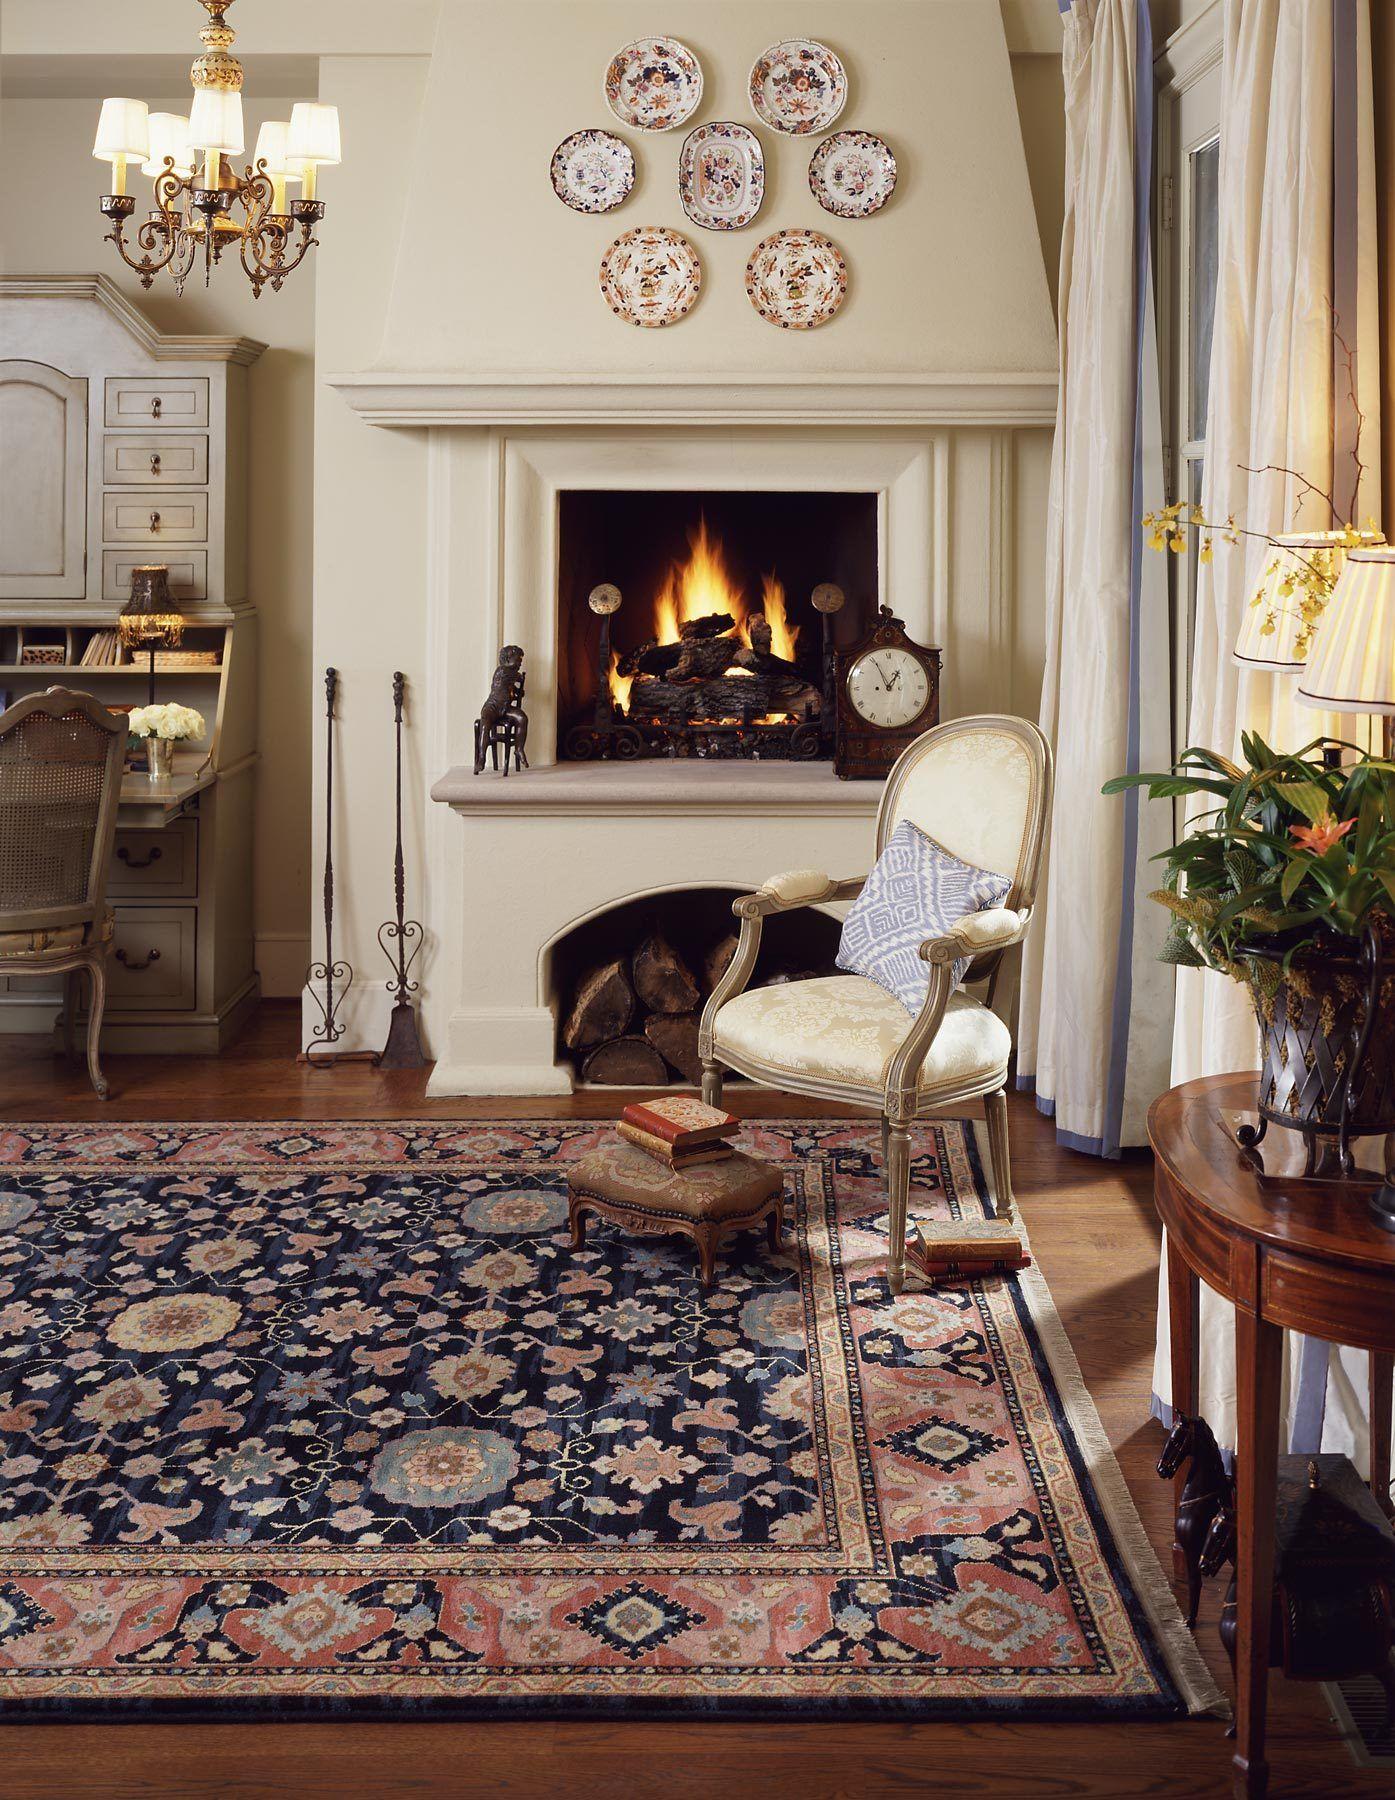 1c22__rug_fireplace2.jpg